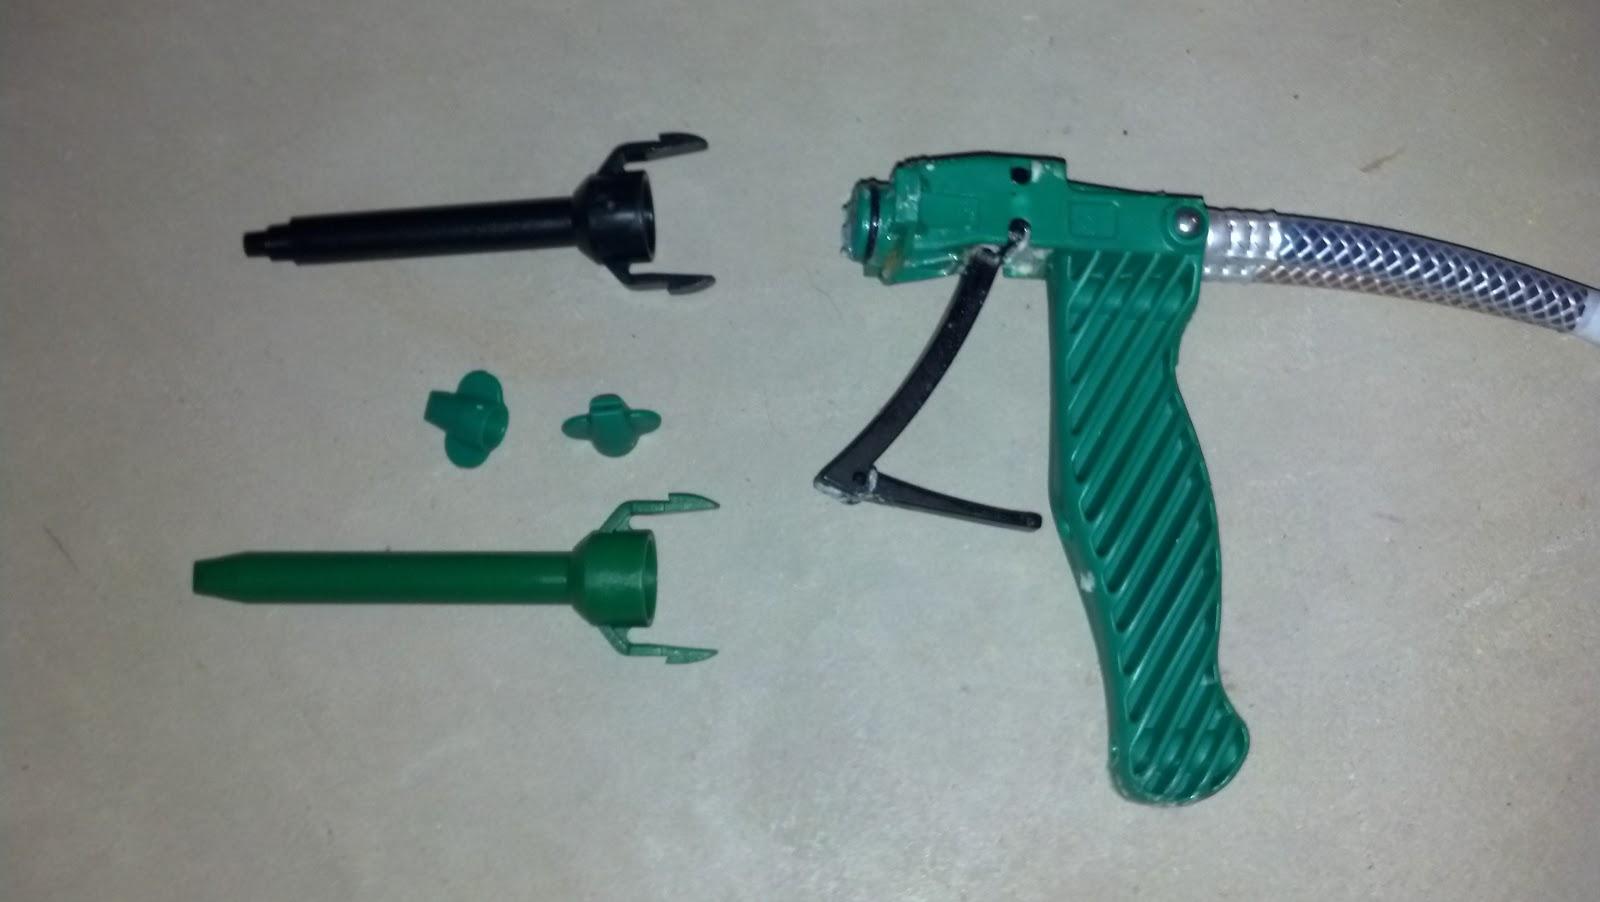 Diy spray foam insulation foam it green review spray gun and removable spray tips solutioingenieria Images